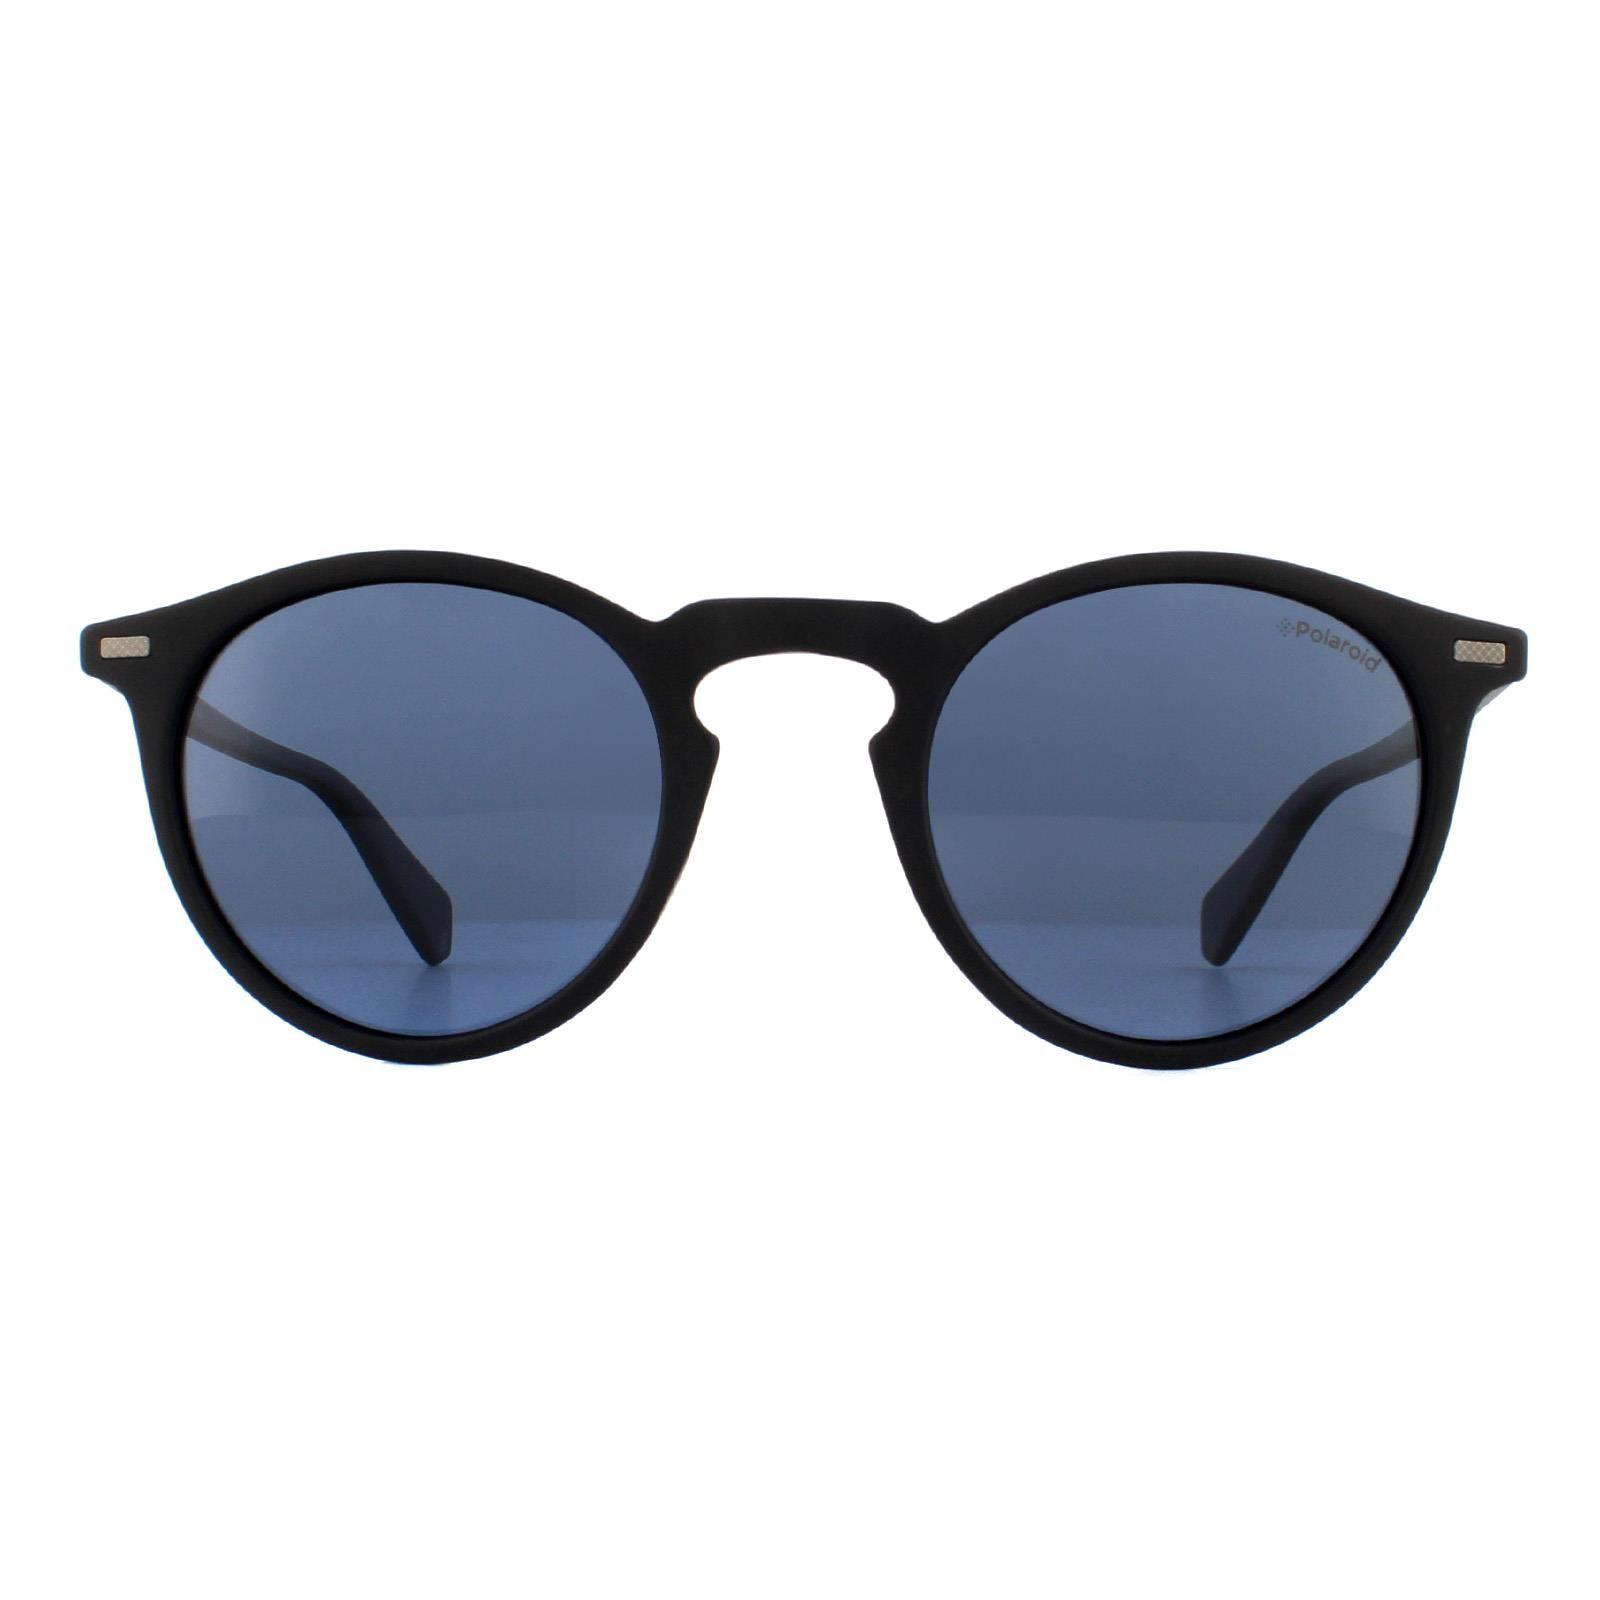 Polaroid Sunglasses PLD 2086/S 003 C3 Matte Black Grey Polarized